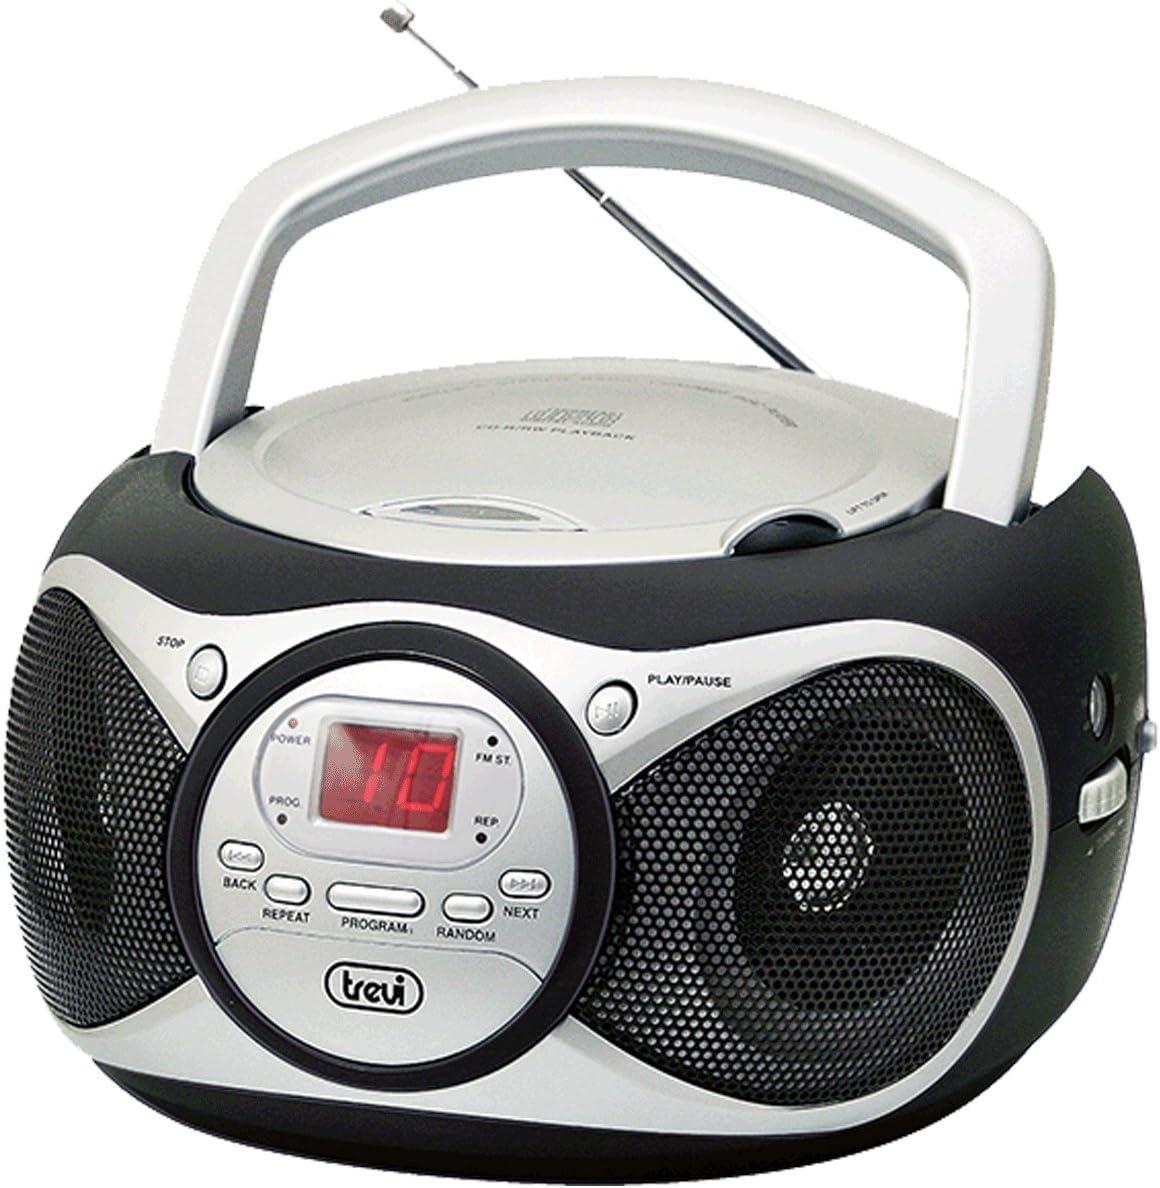 Trevi CD 512 - Radio CD (Digital, Am, FM, 87.5-108 MHz, Jugador, CD, CD-R, CD-RW, 6W) Negro, Plata